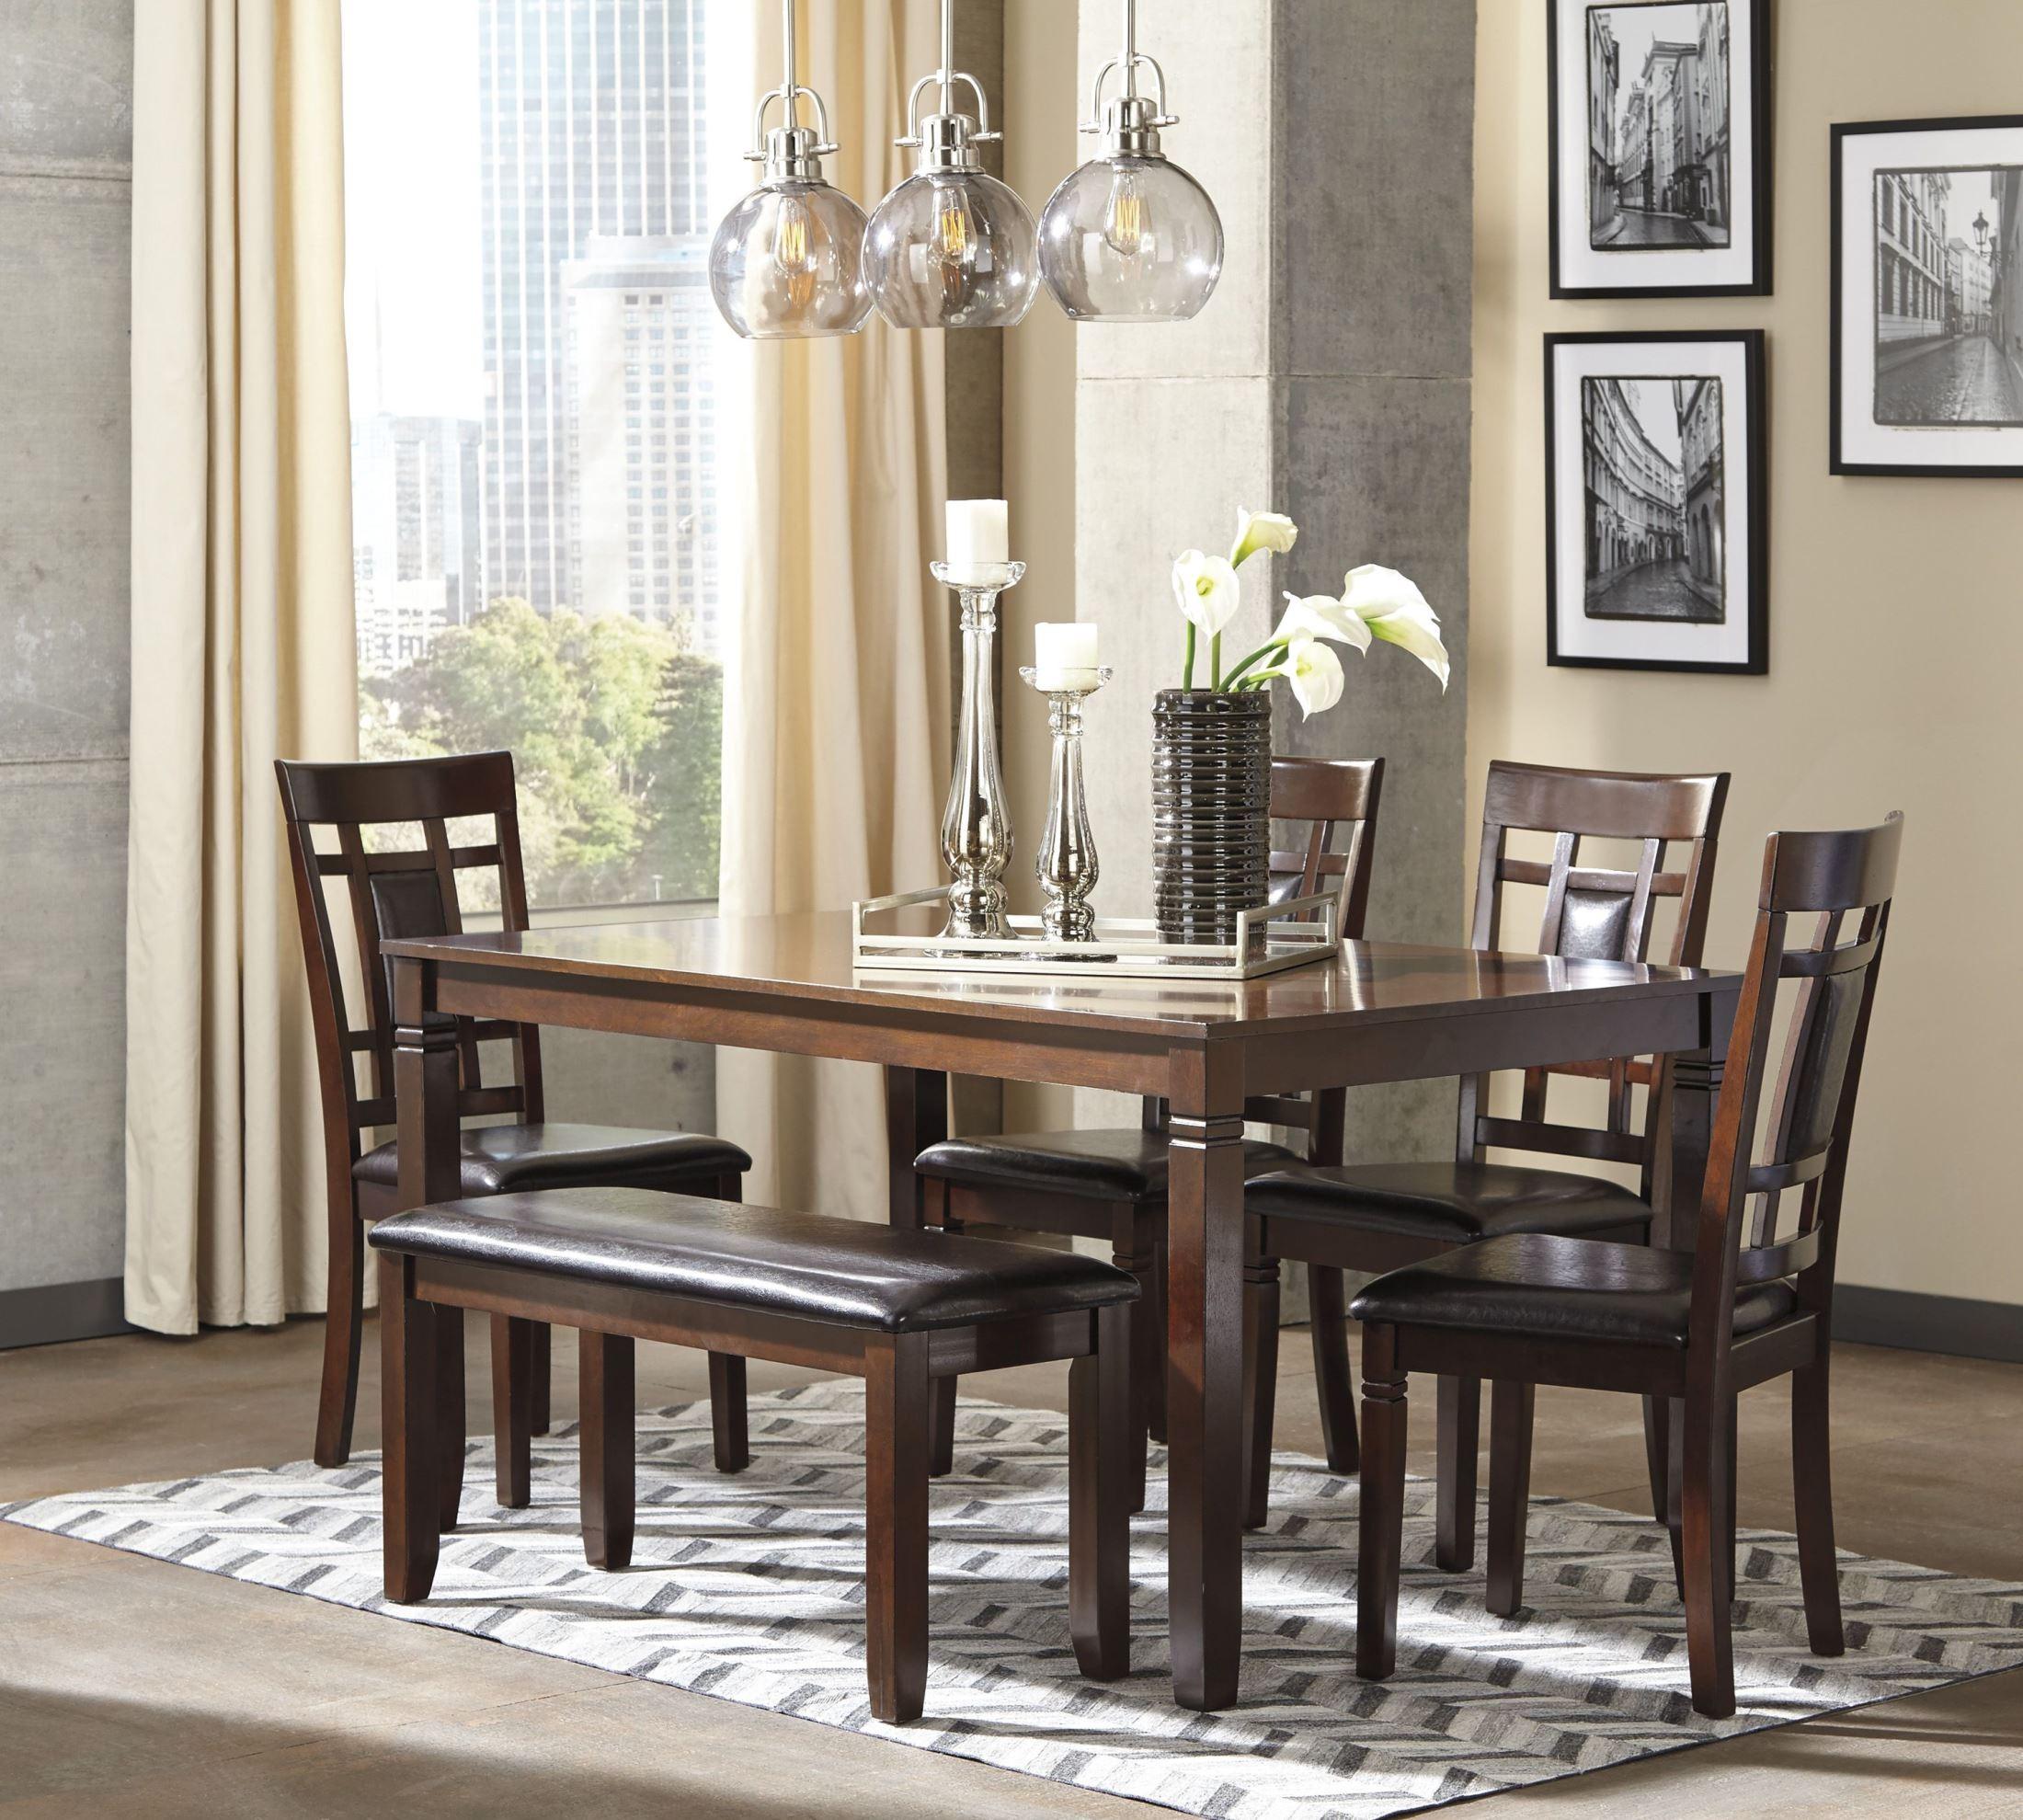 Dining Room Sets For 6: Bennox Brown 6 Piece Rectangular Dining Room Set, D384-325